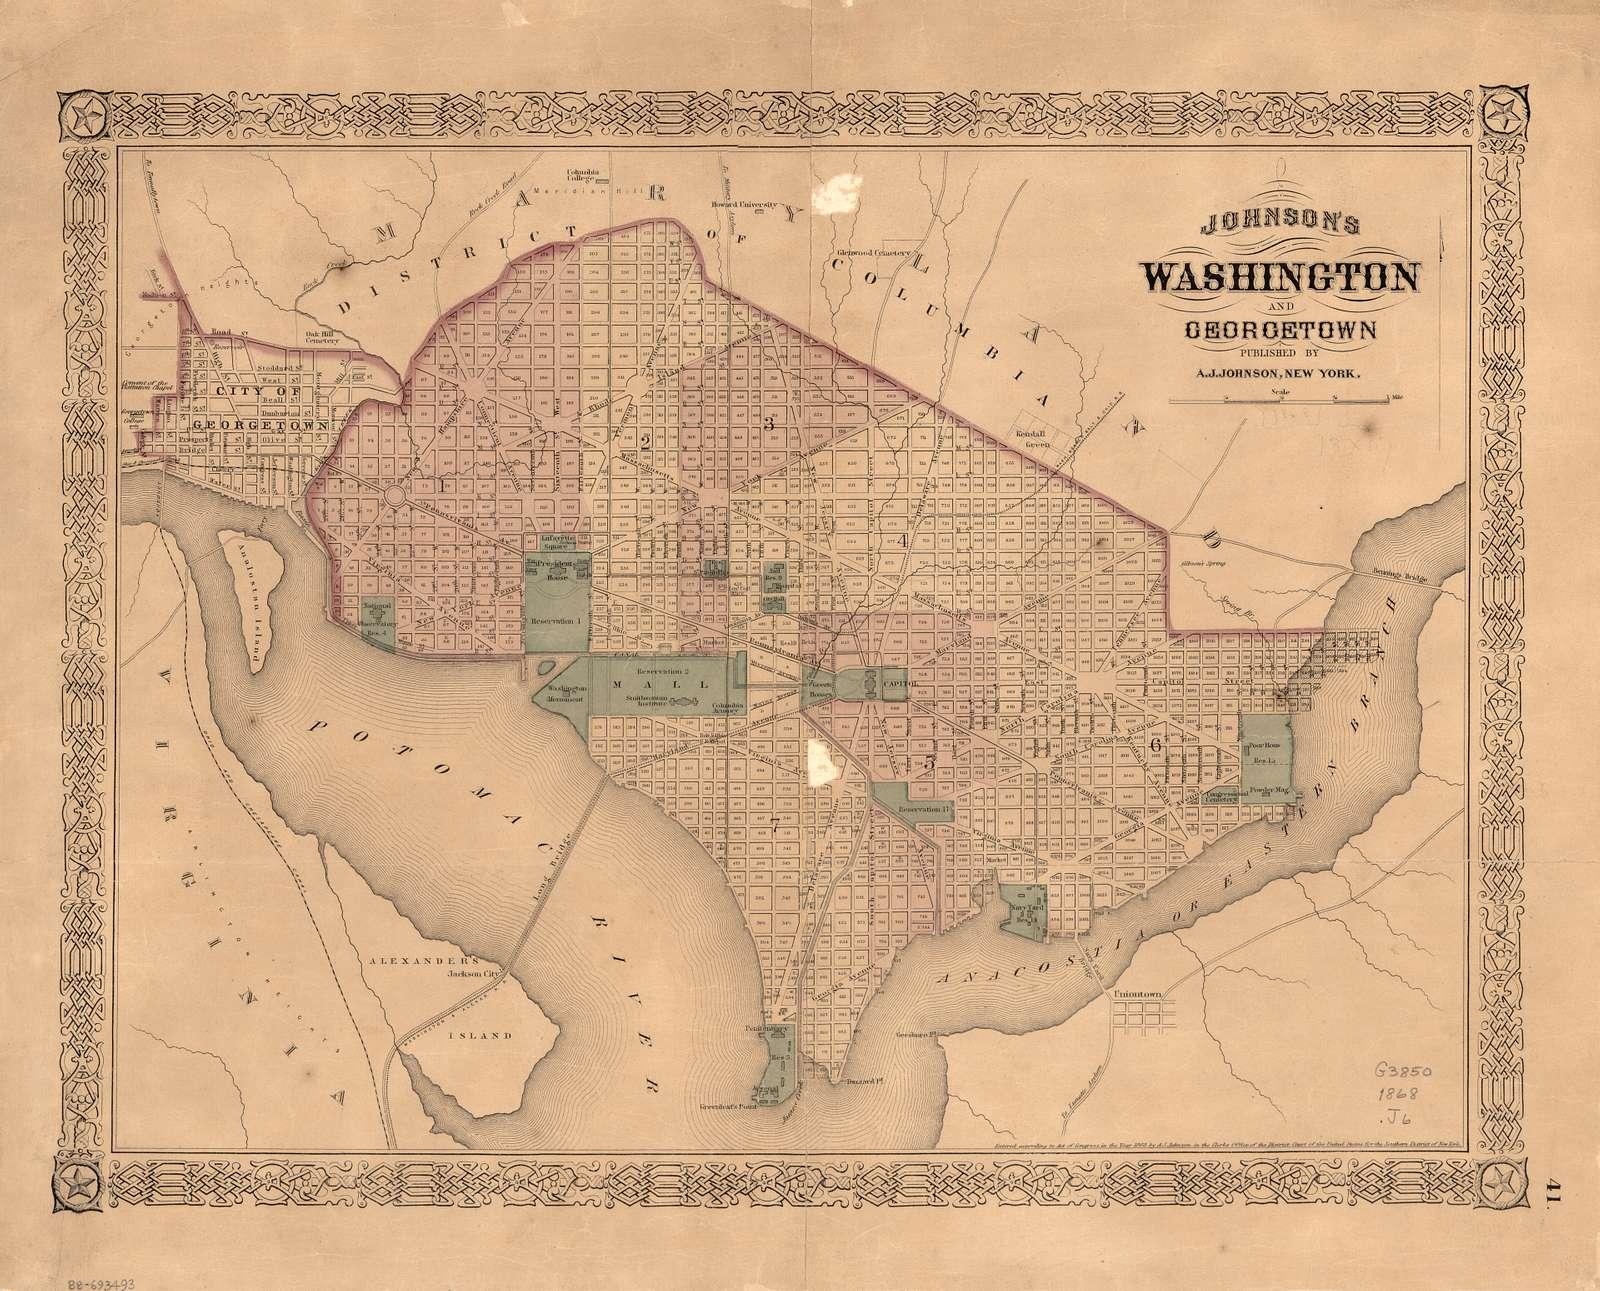 Johnson's Washington and Georgetown.